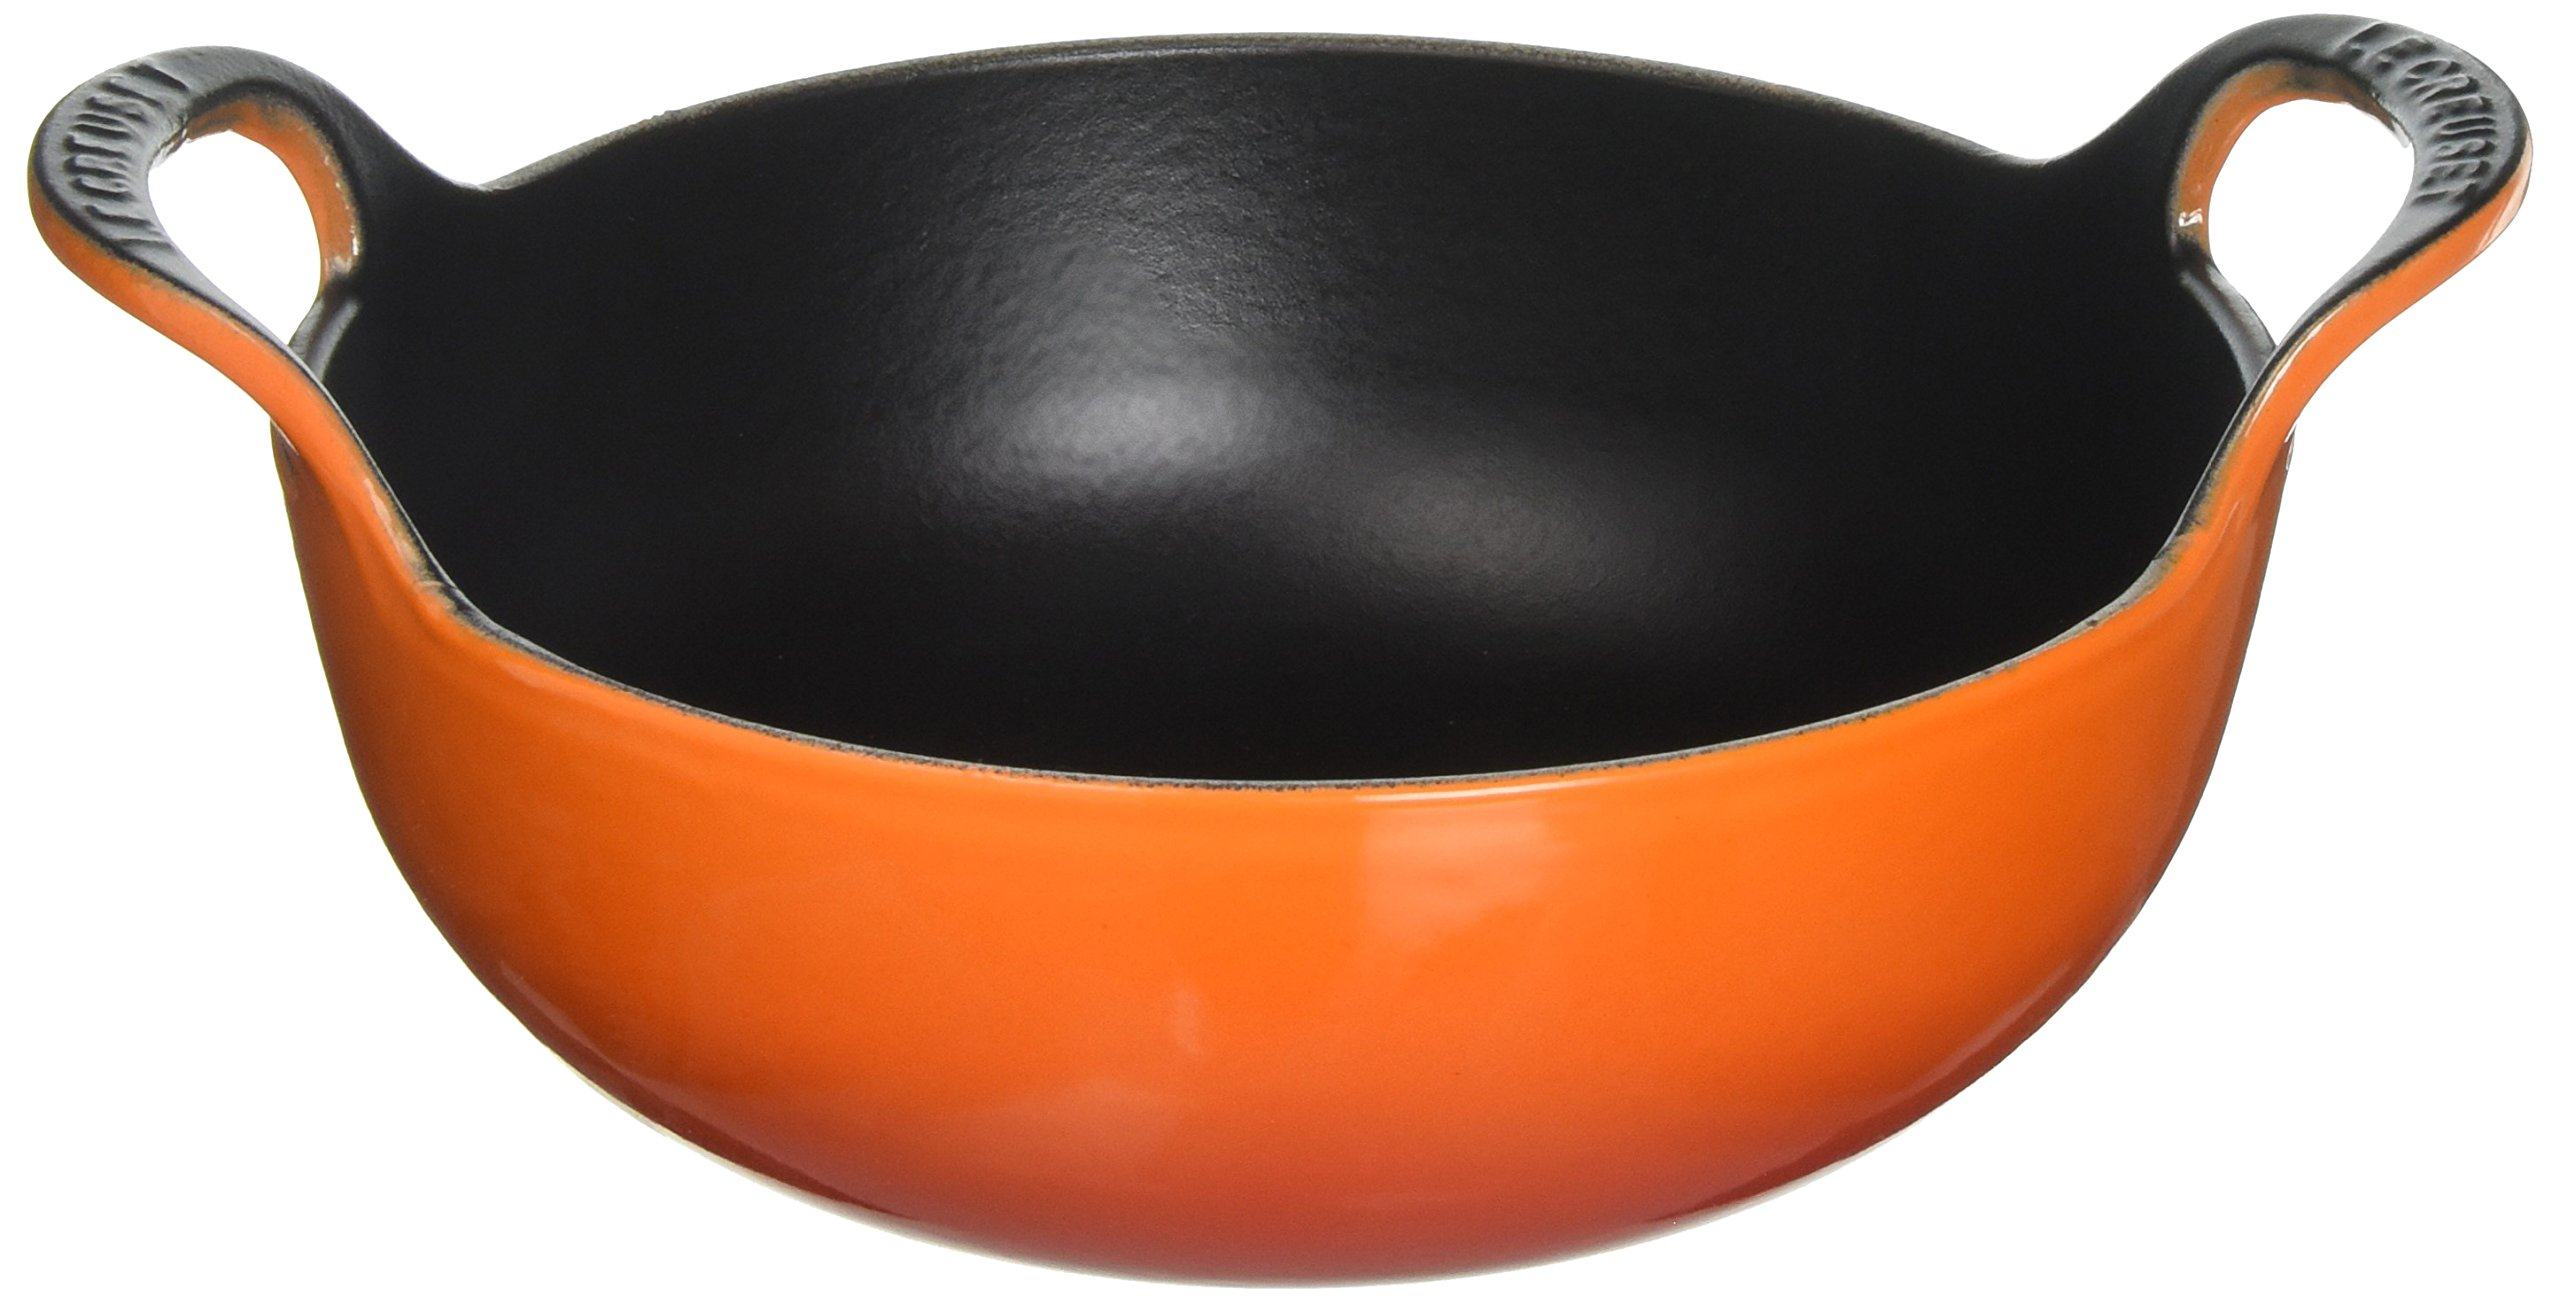 Le Creuset of America Enameled Cast Iron Balti Dish, 2-Quart, Flame